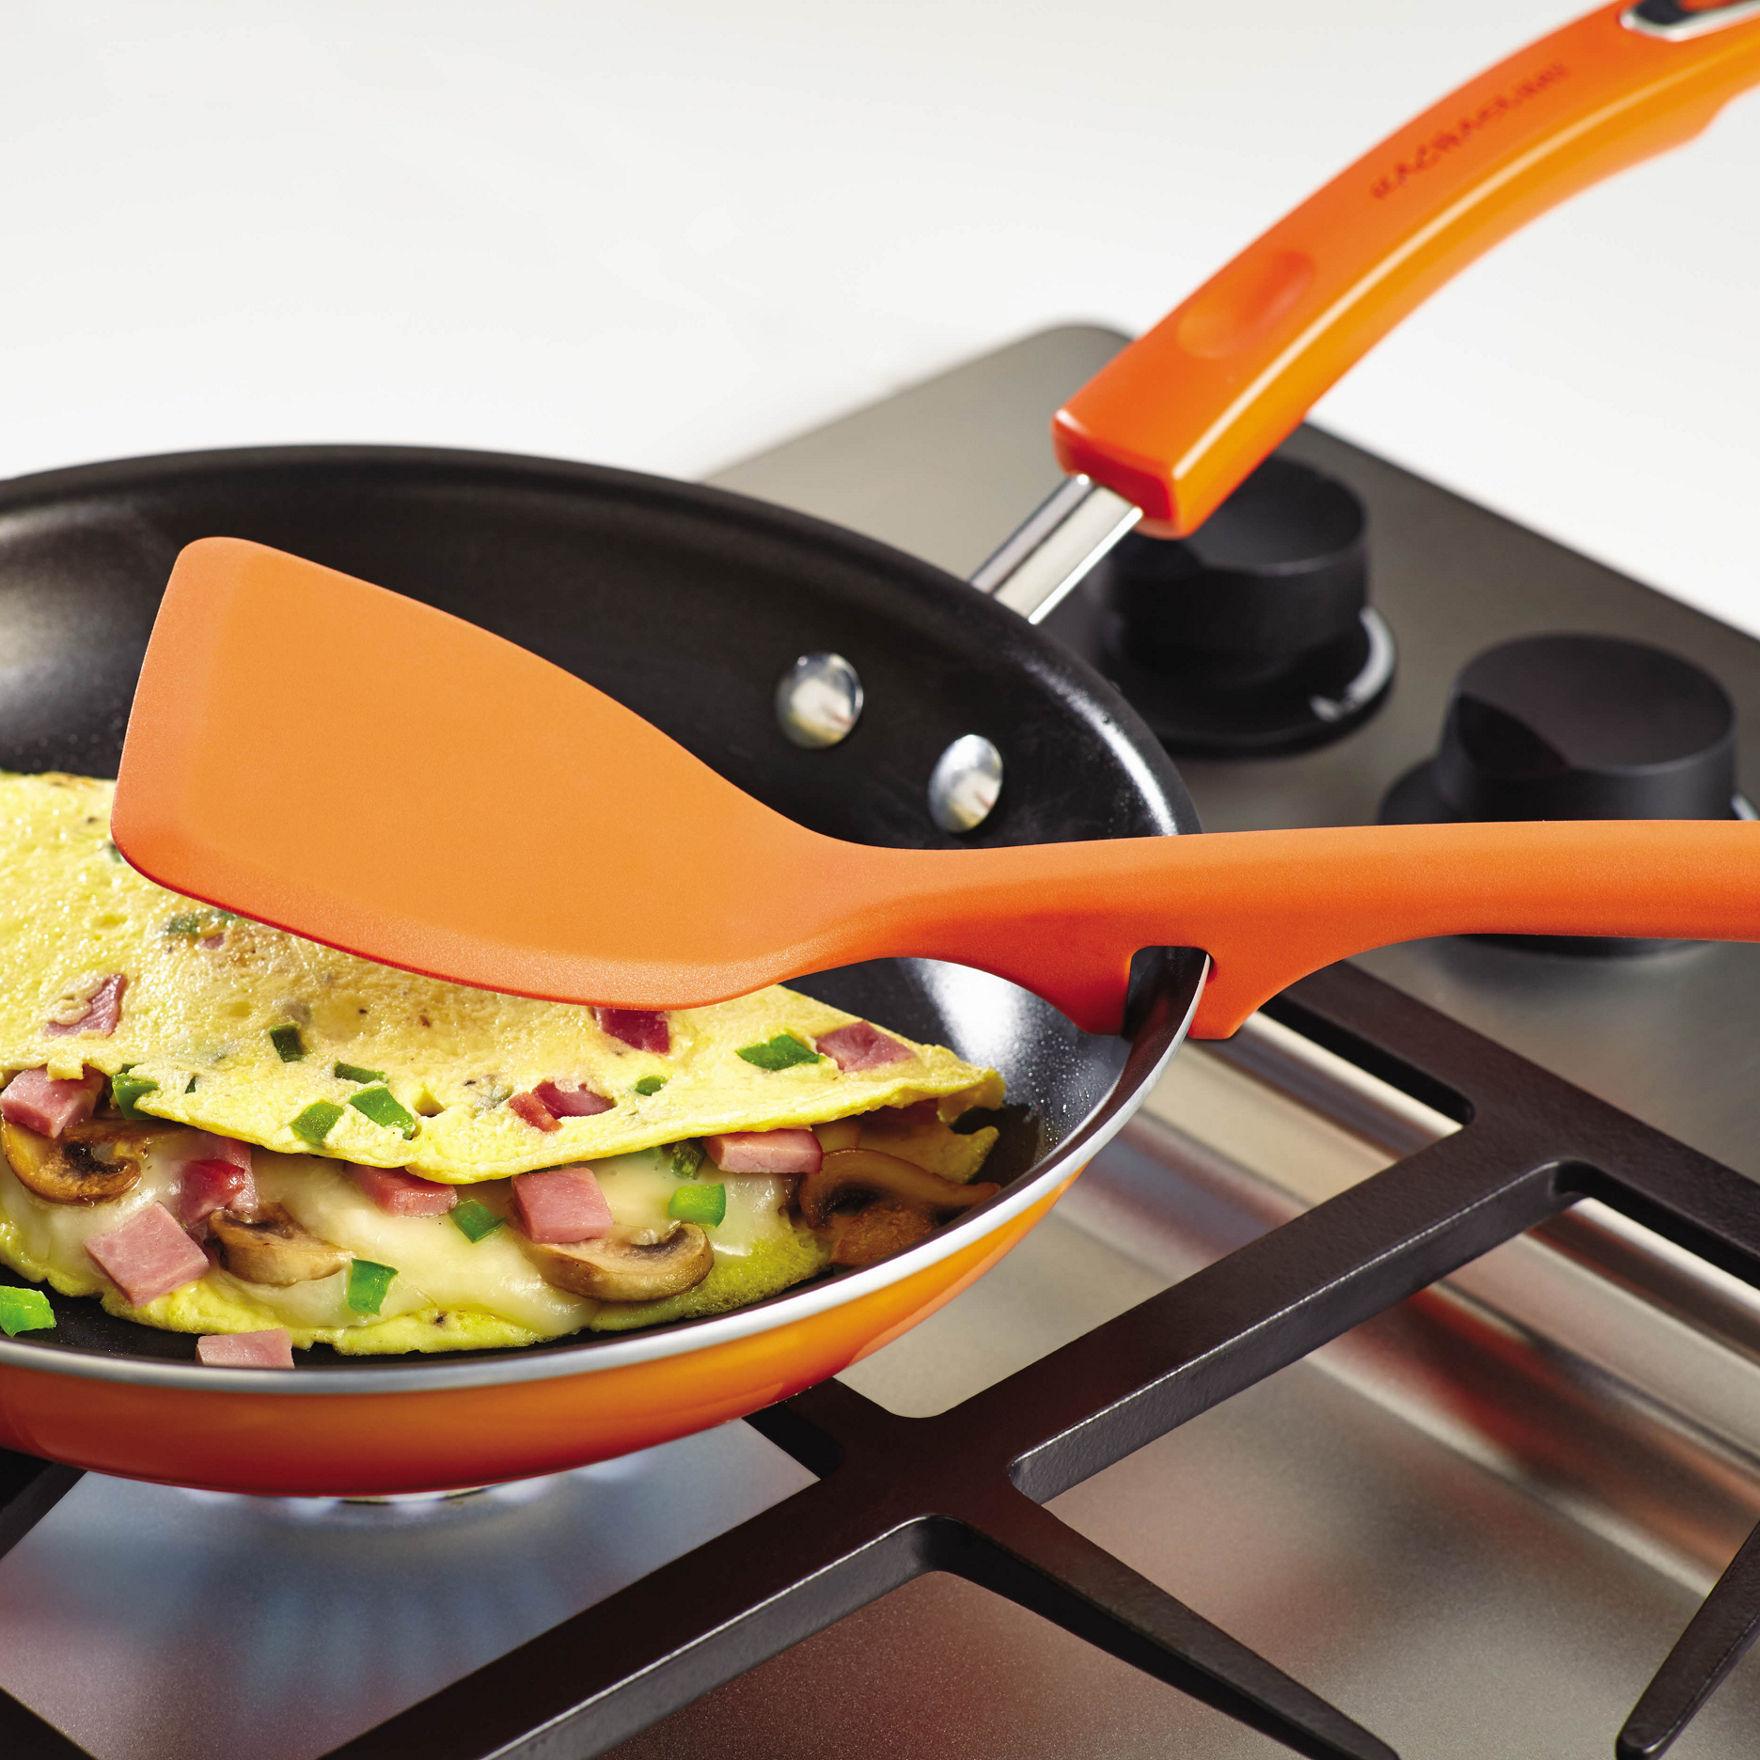 Rachael Ray Orange Pots & Dutch Ovens Cookware